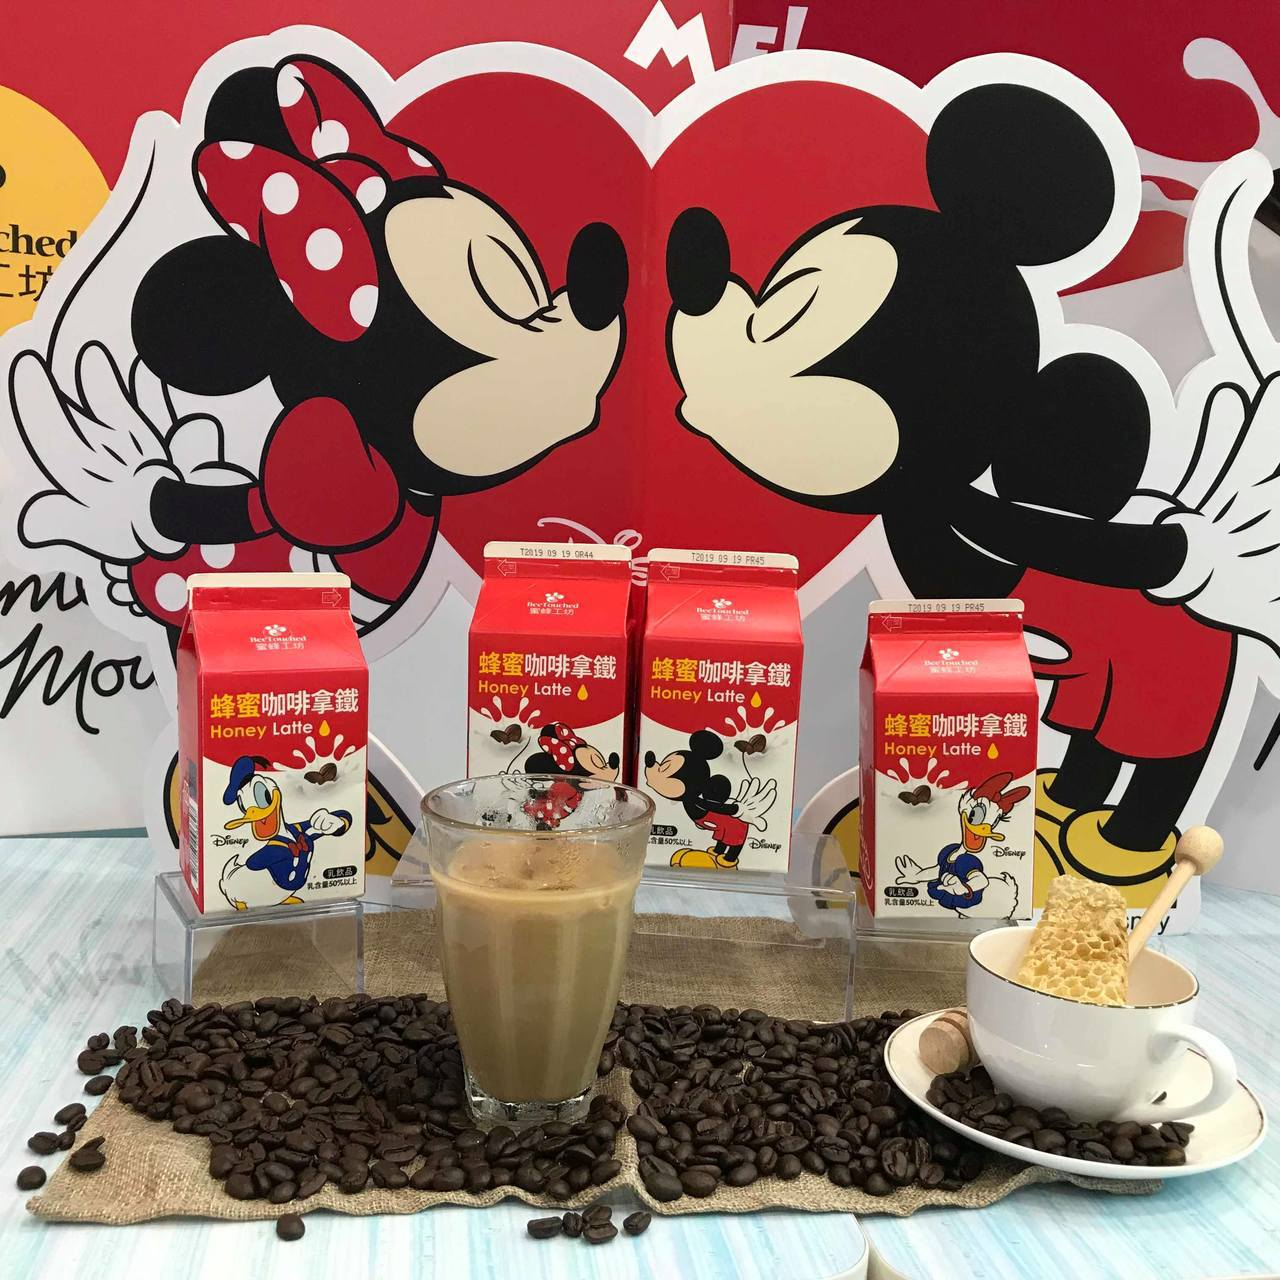 7-ELEVEN獨家販售的「蜜蜂工坊」蜂蜜咖啡拿鐵,共有米奇、米妮、唐老鴨、黛西...